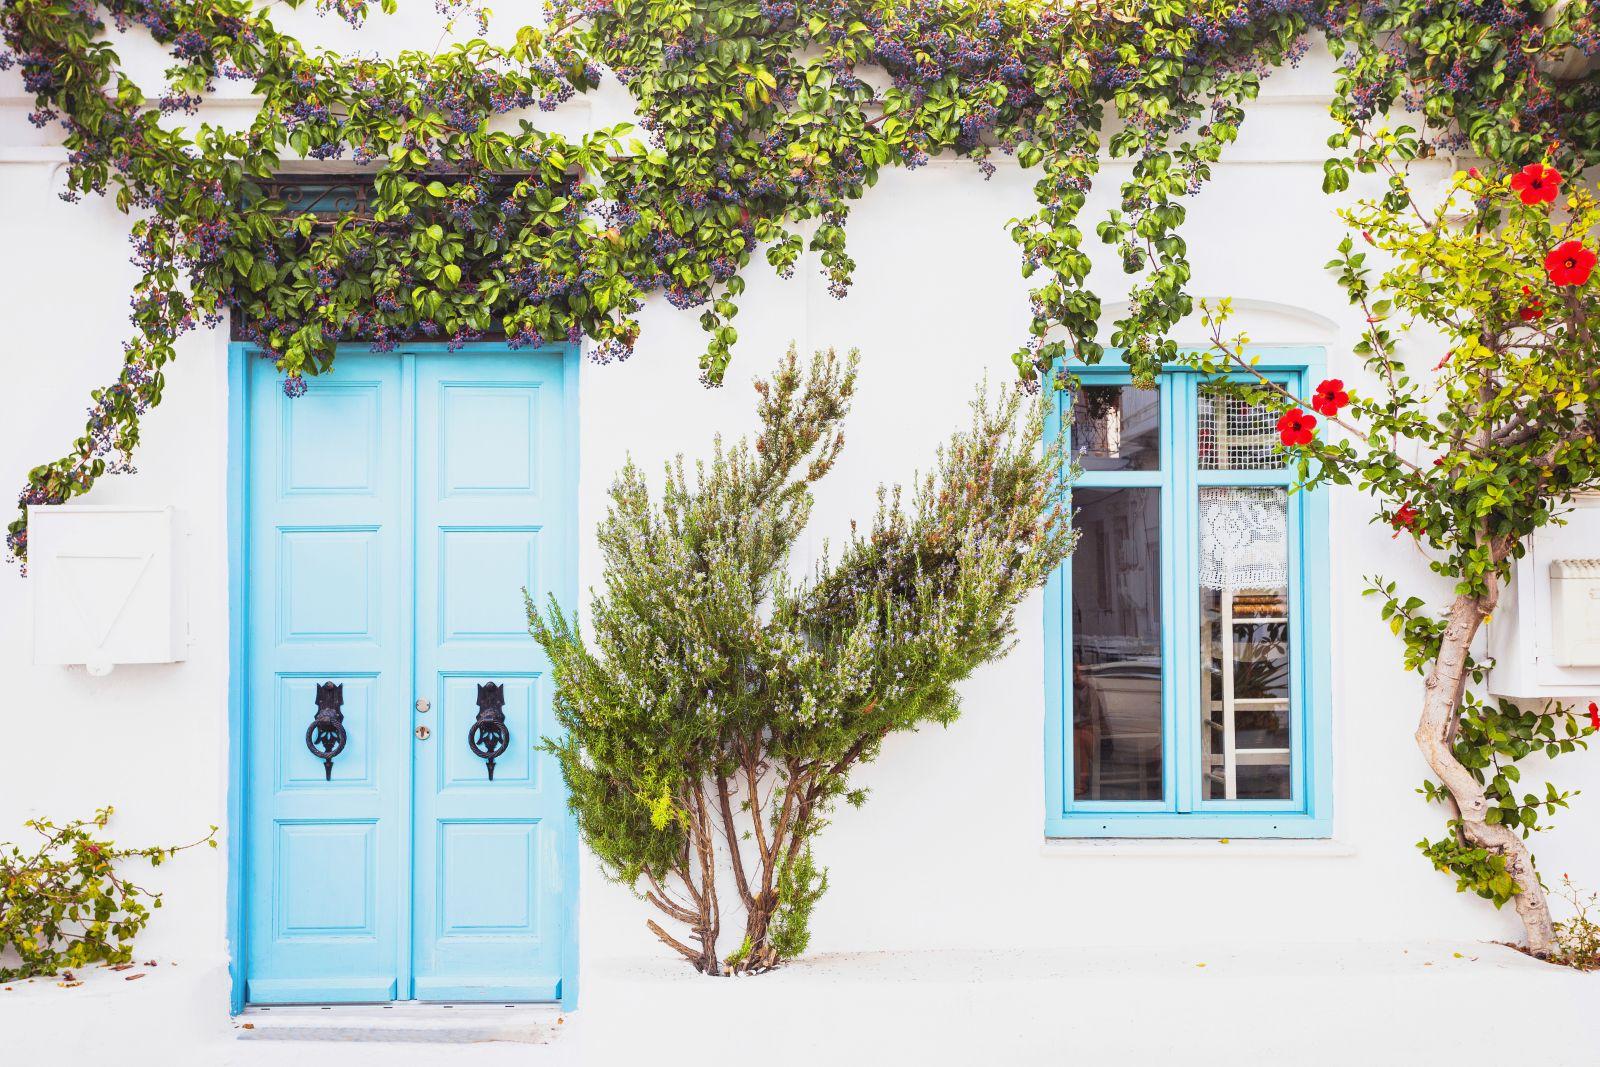 Make Happy Memories - Why Greece - Minimalist Magic